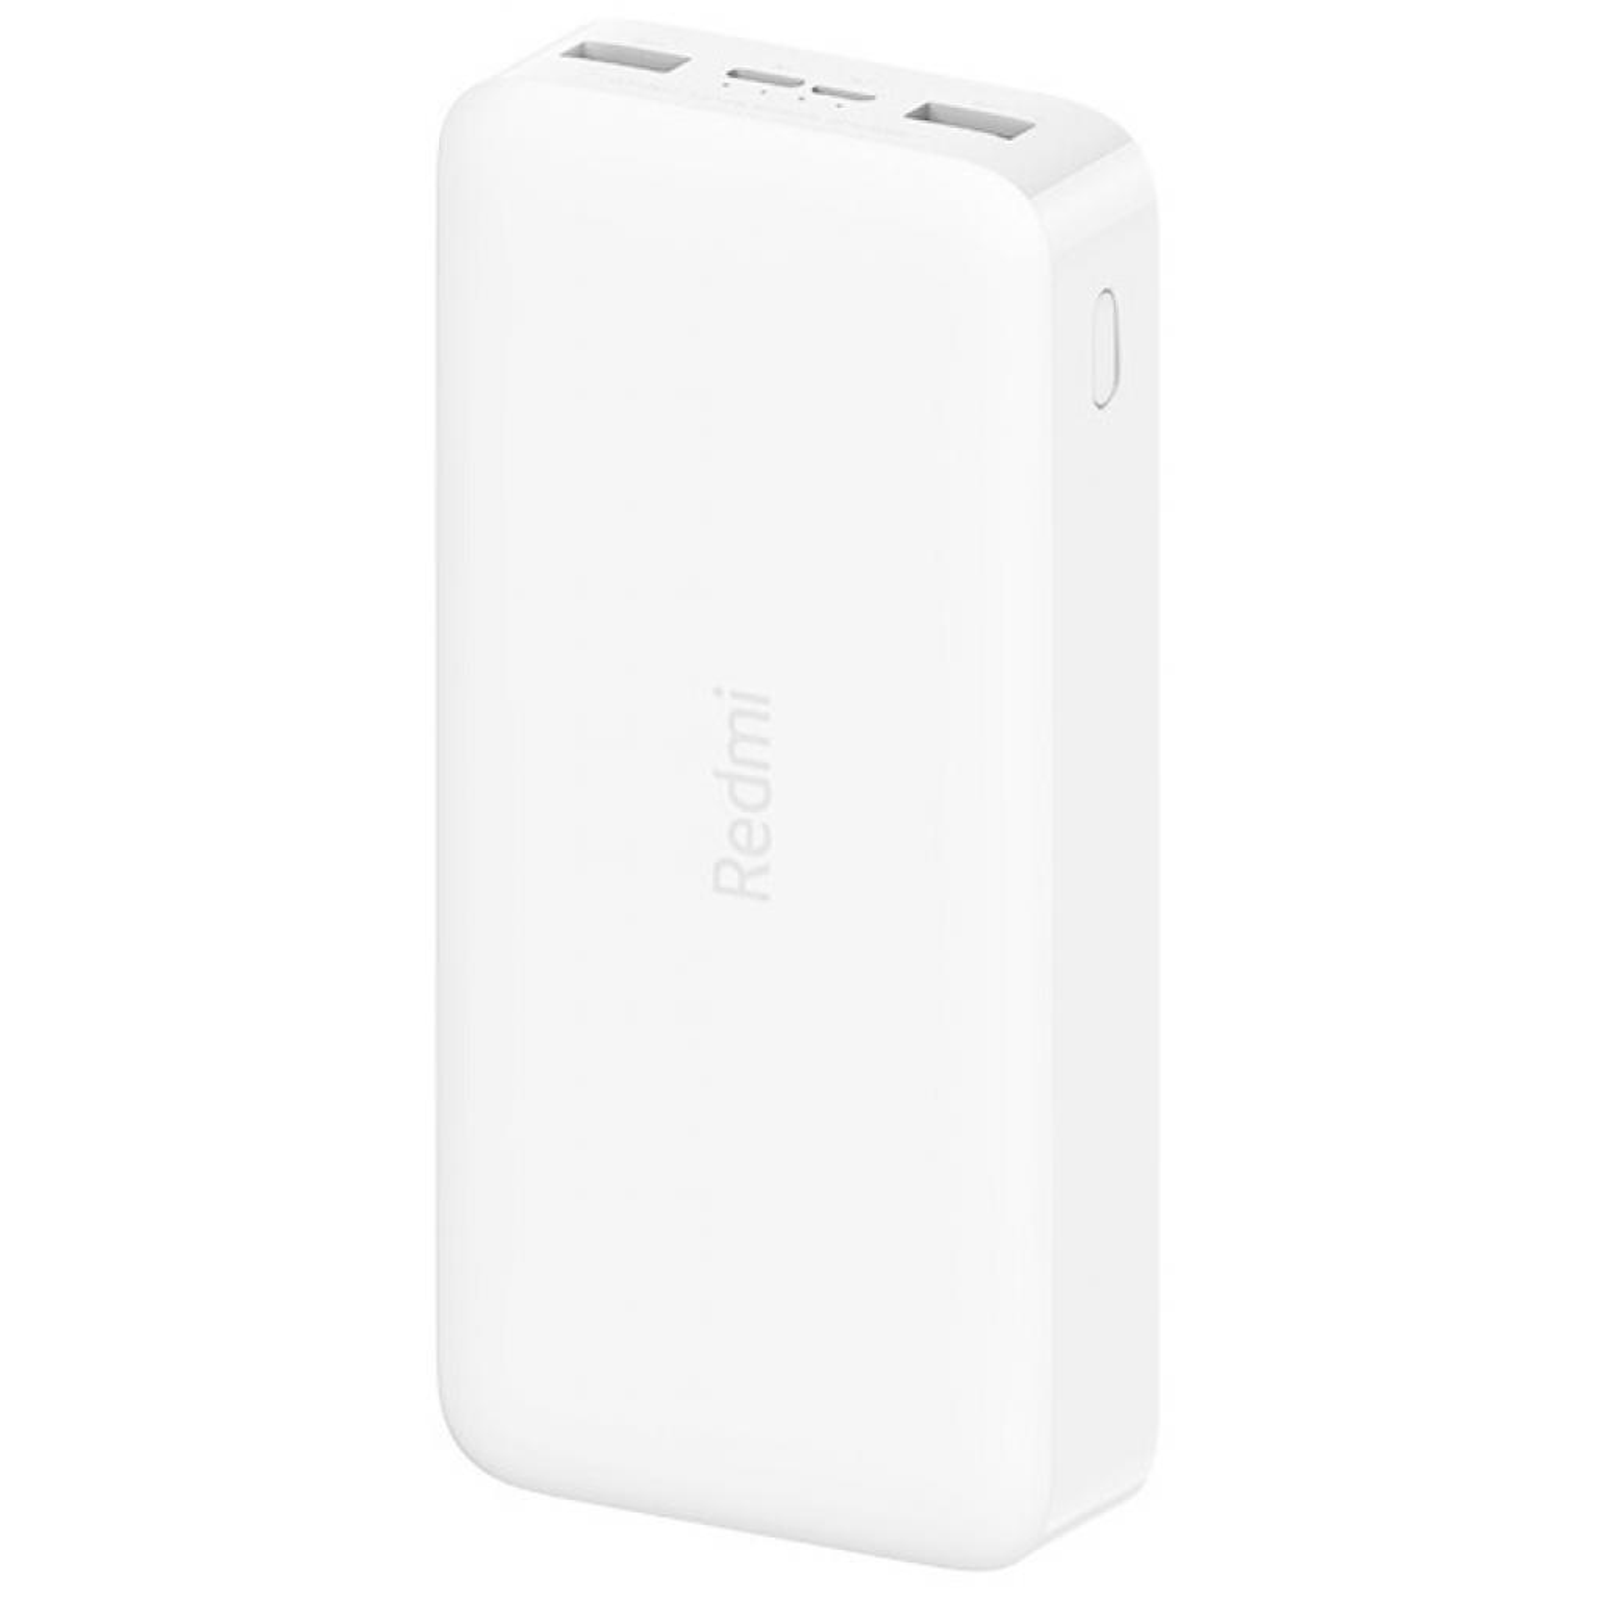 Батарея универсальная Xiaomi Redmi 20000mAh (in 2.1A Micro-USB,Type-C/ out 2*2.4A) White (VXN4265CN / VXN4285) изображение 2